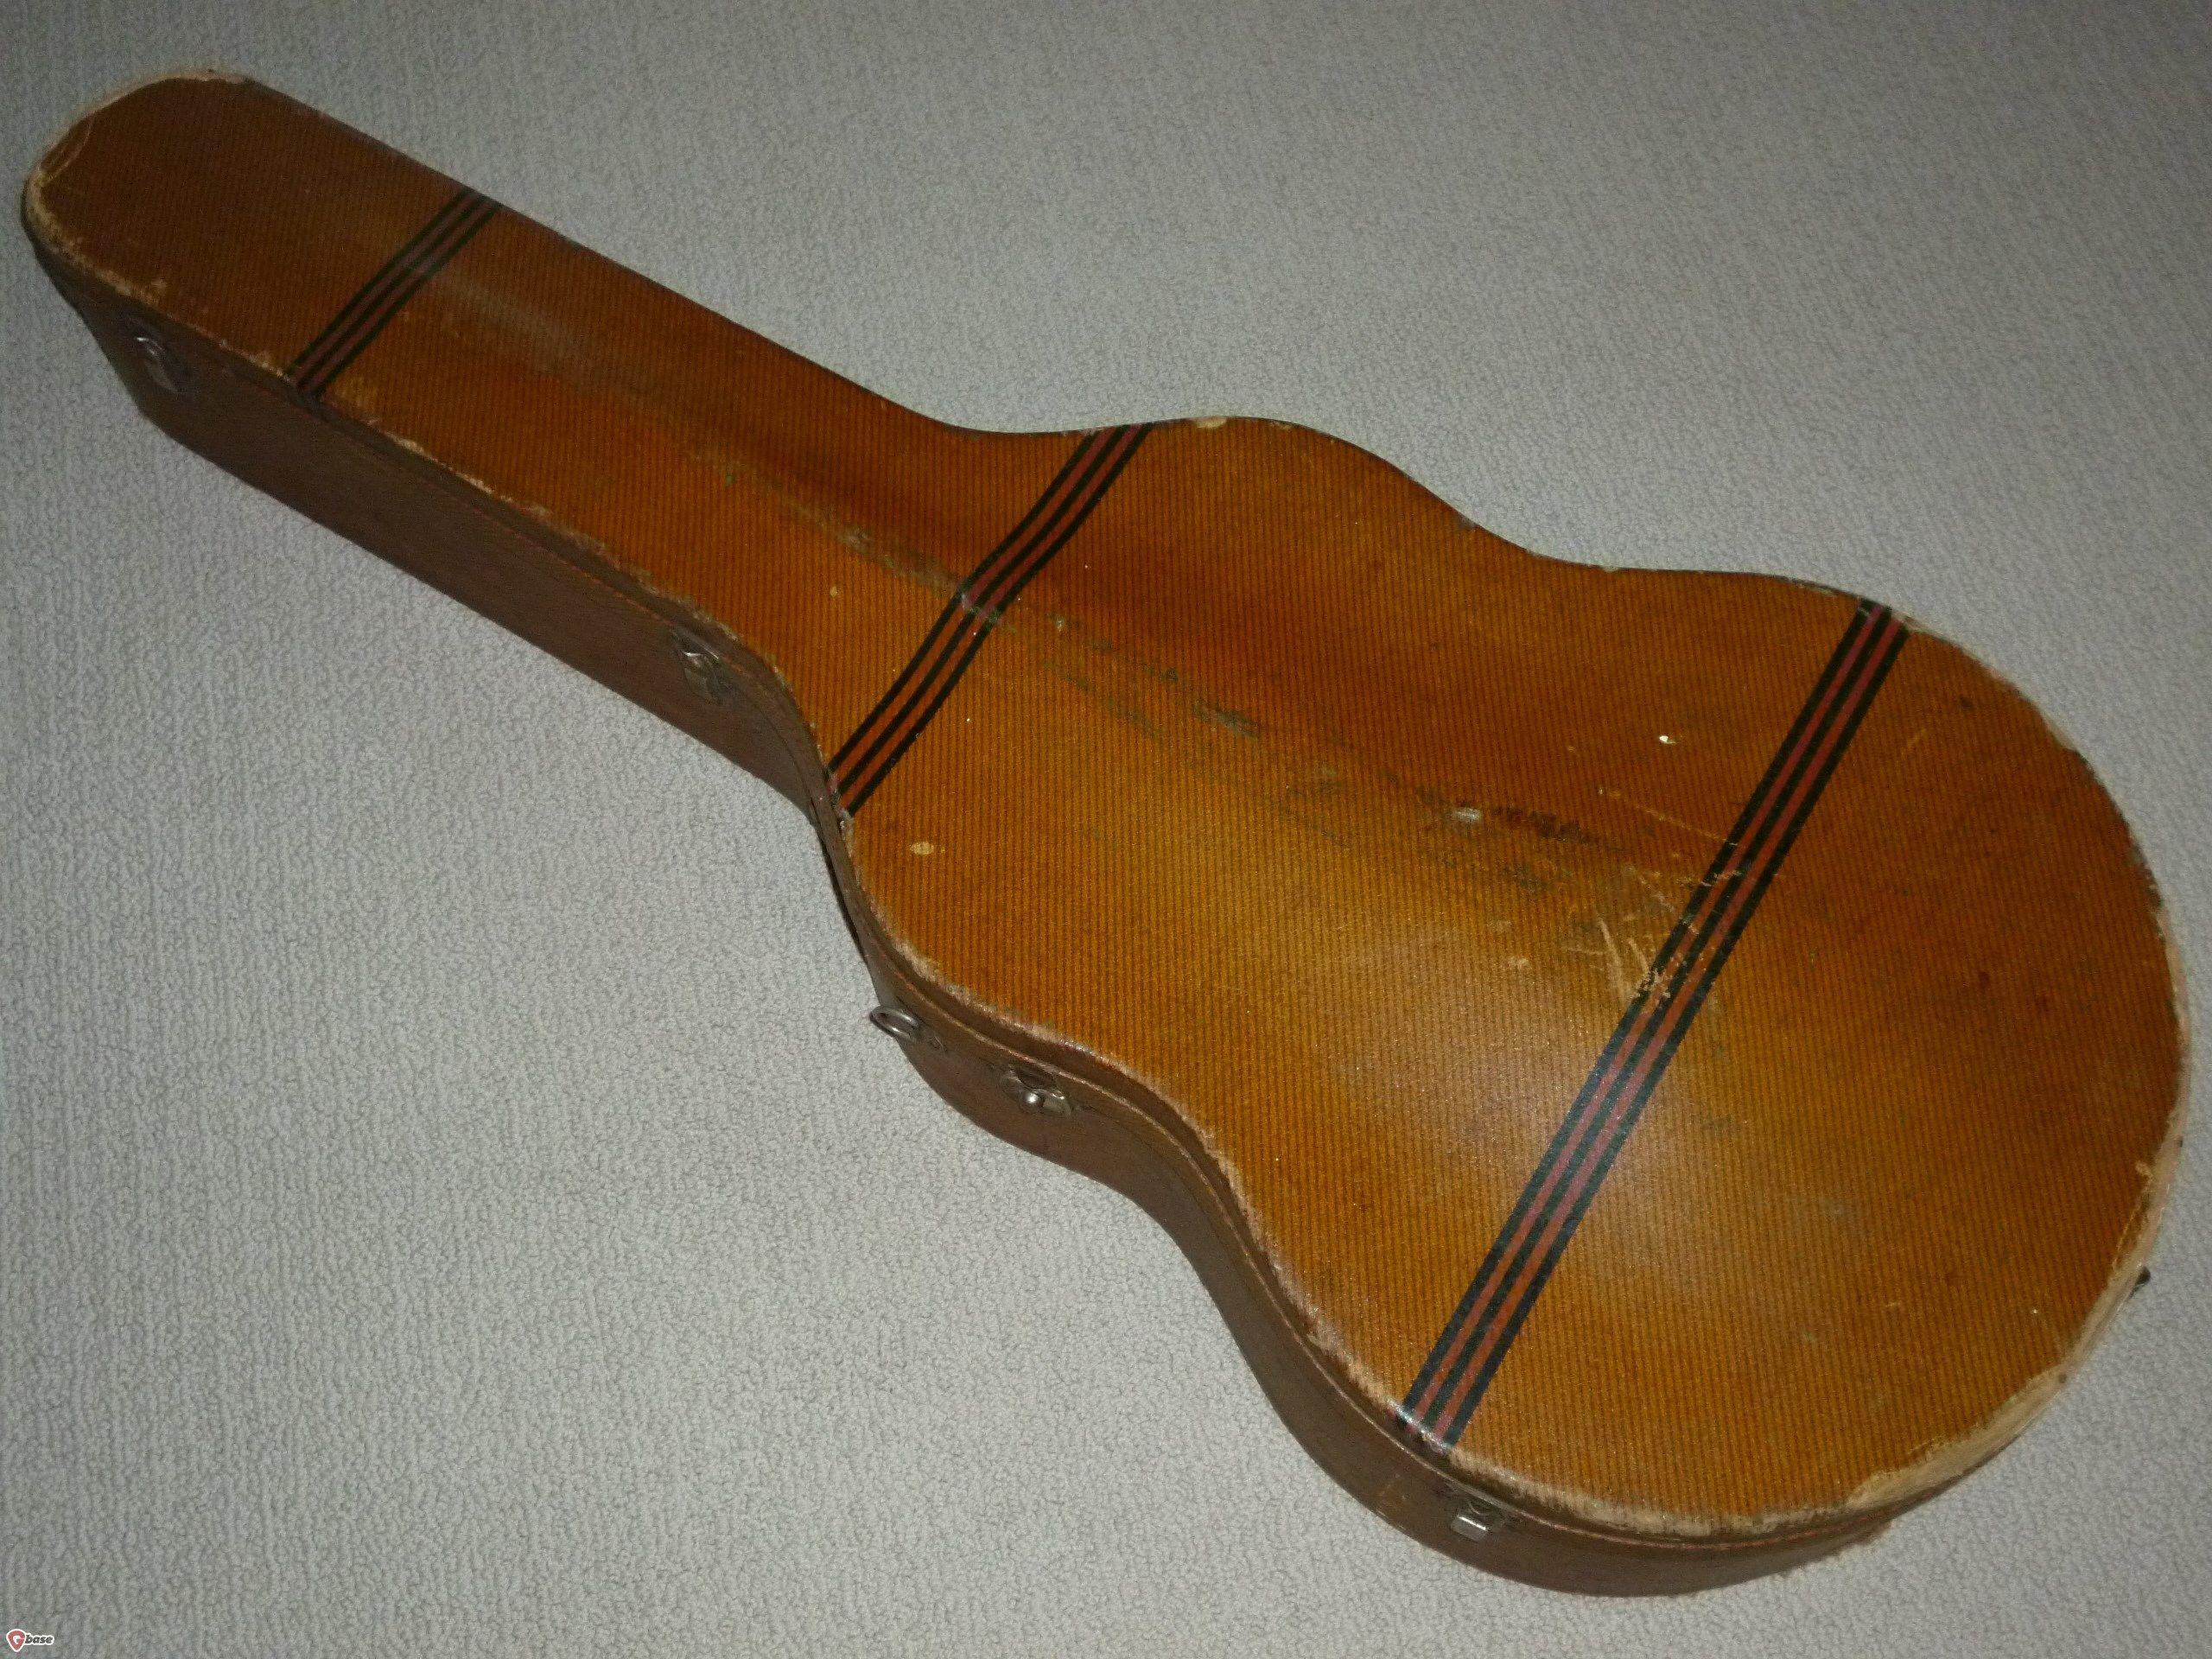 gibson racing stripes case guitar cases guitar accessories guitar guitar case. Black Bedroom Furniture Sets. Home Design Ideas